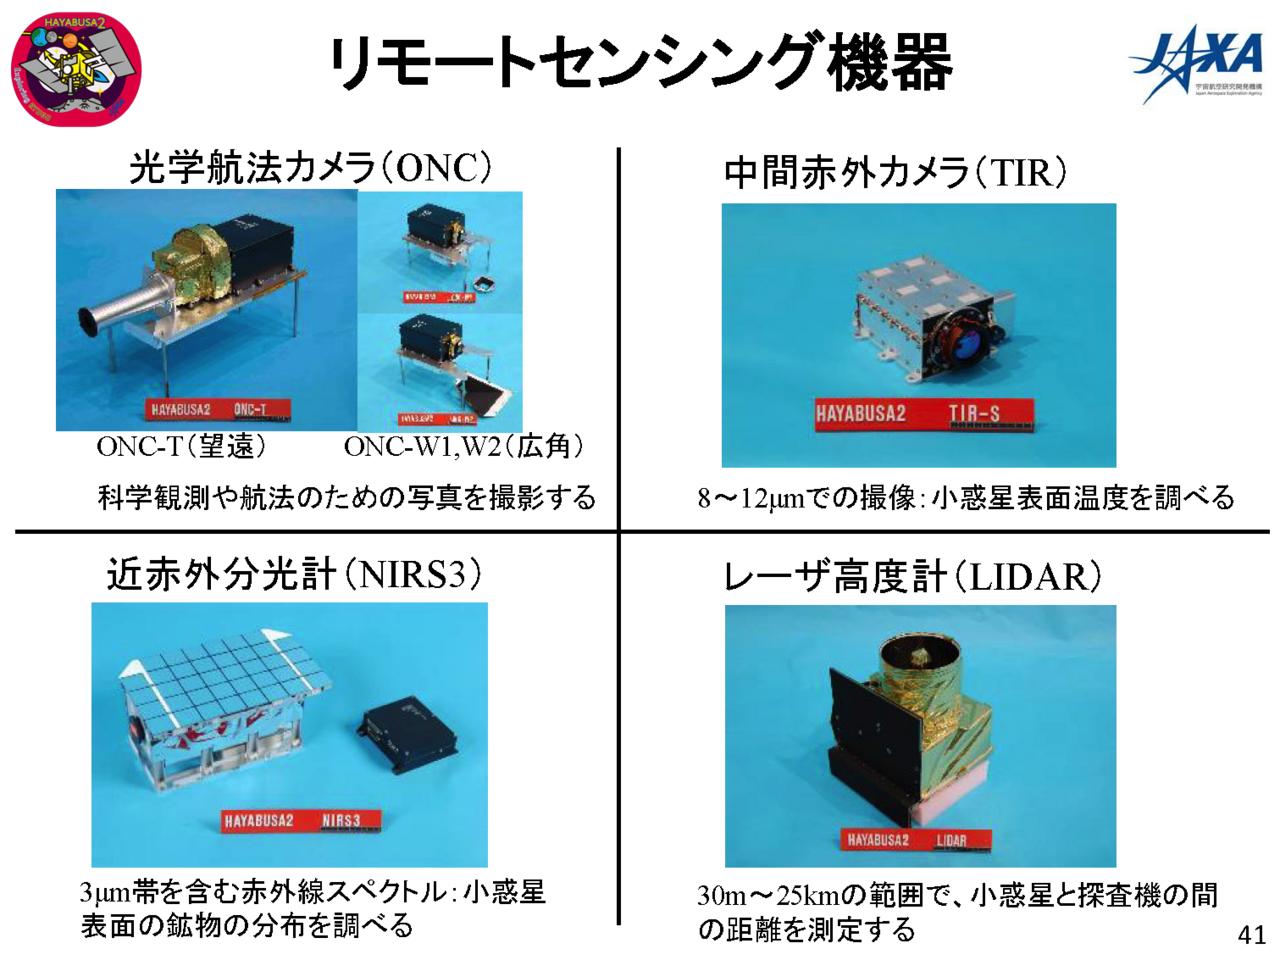 f:id:Imamura:20180802150001p:plain